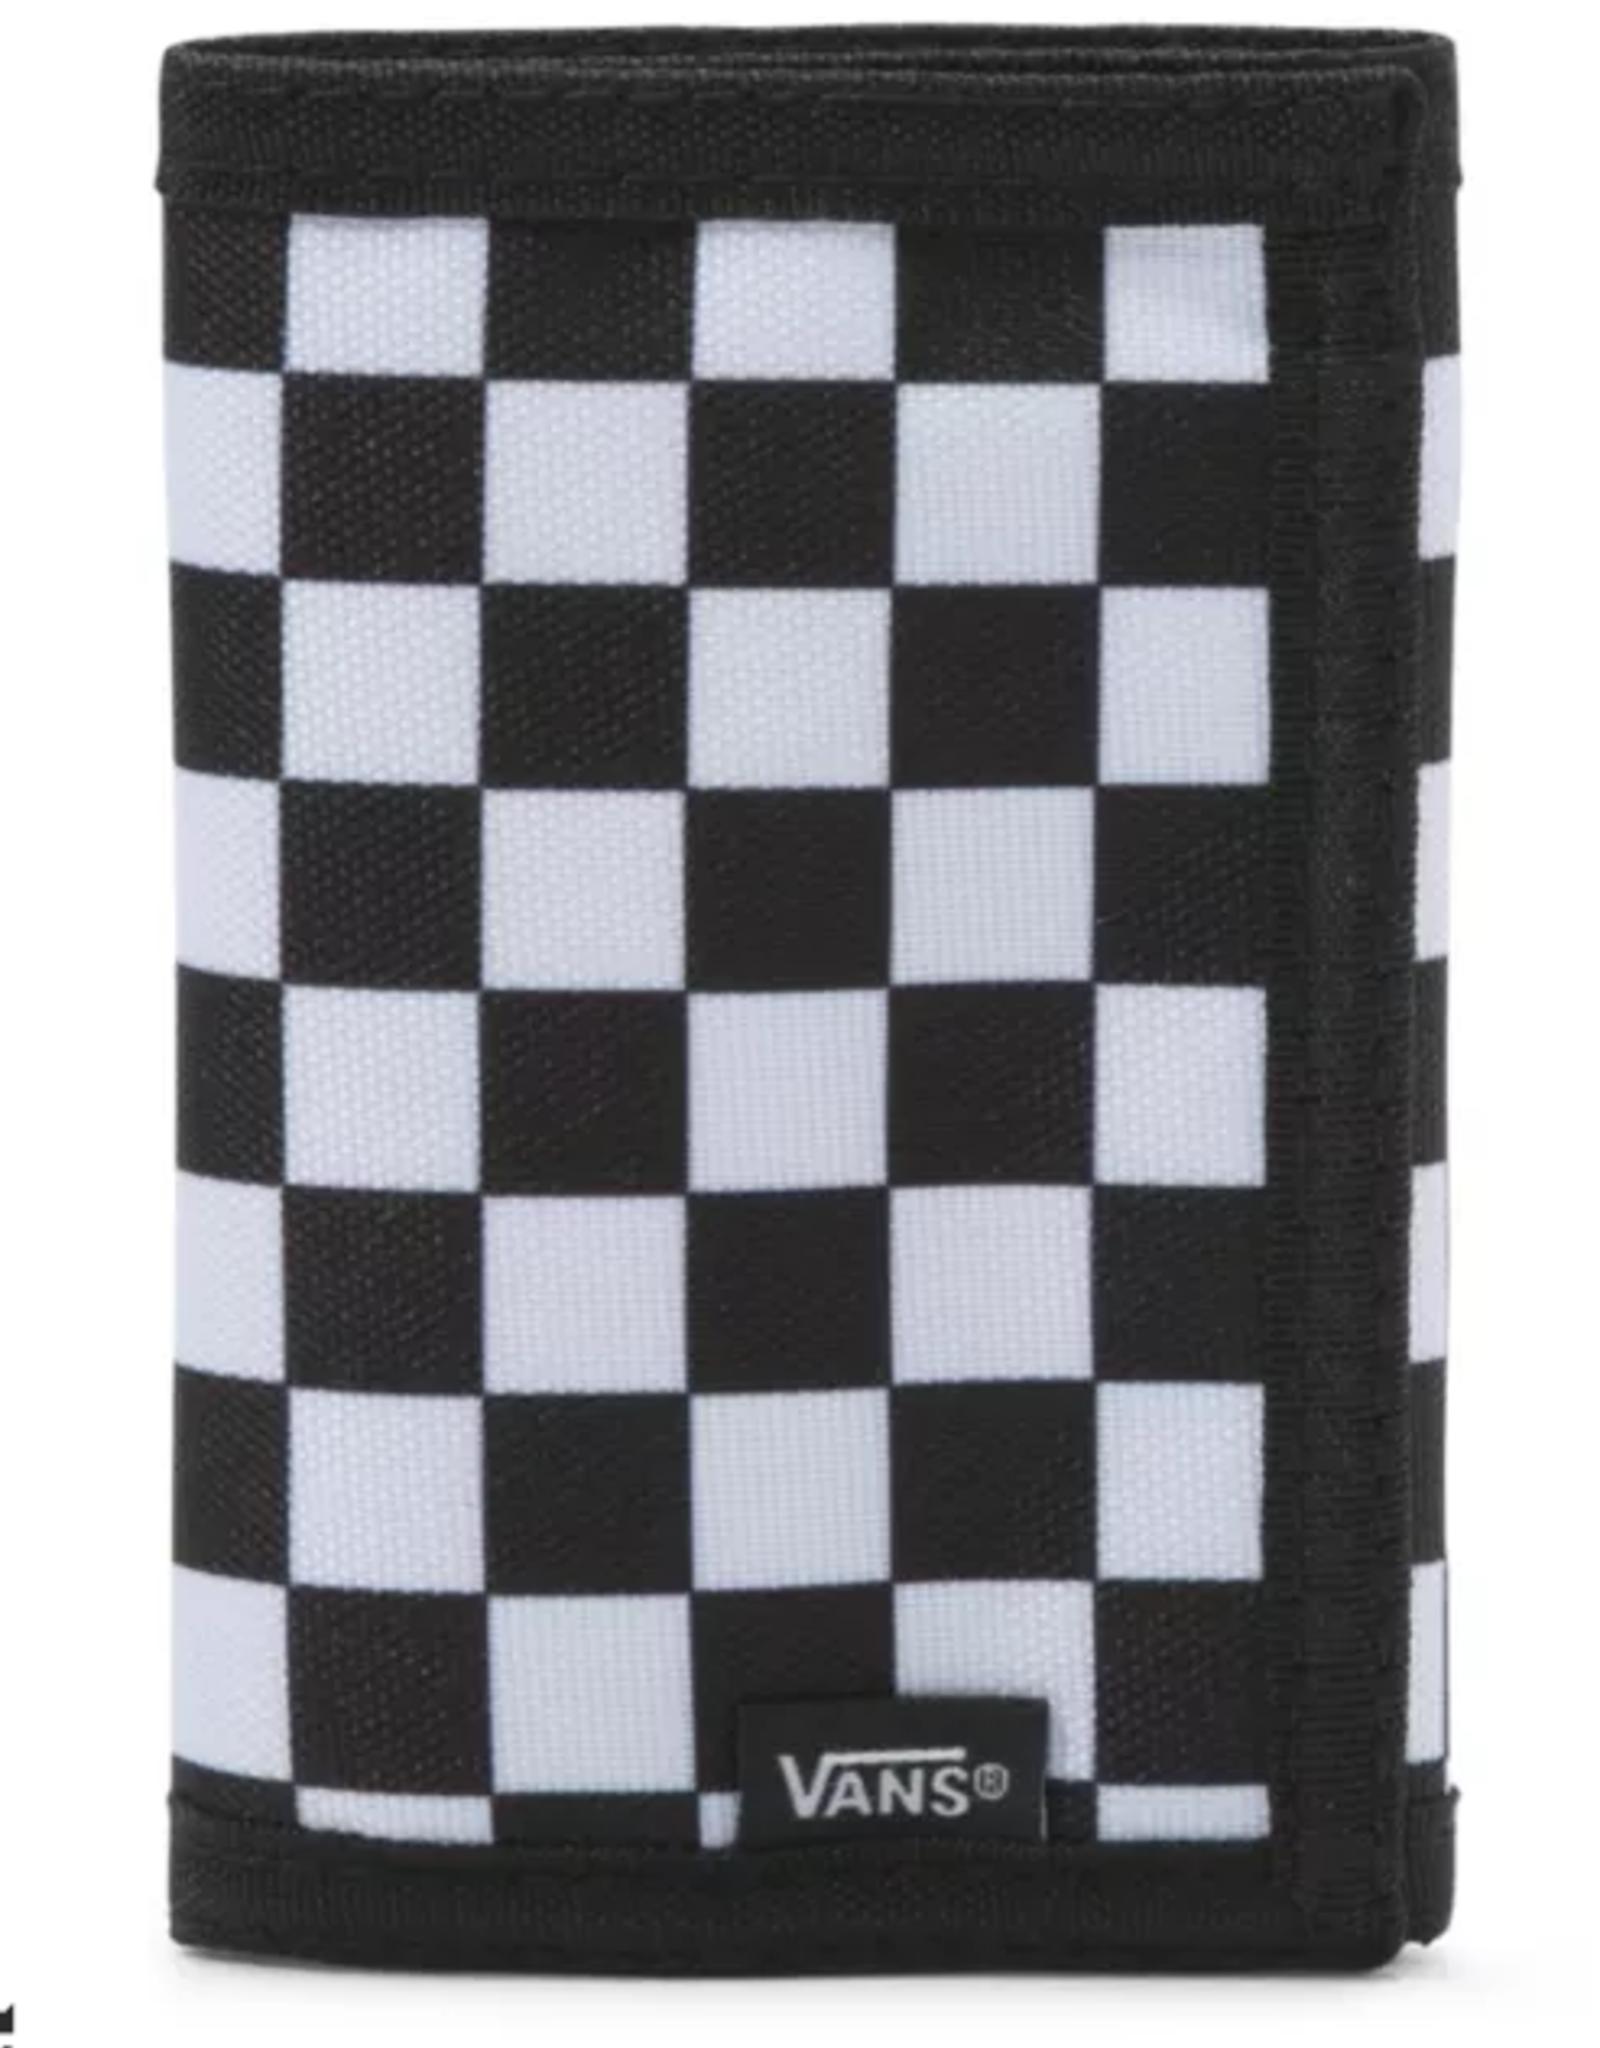 VANS VANS SLIPPED WALLET BLACK WHITE CHECKERBOARD